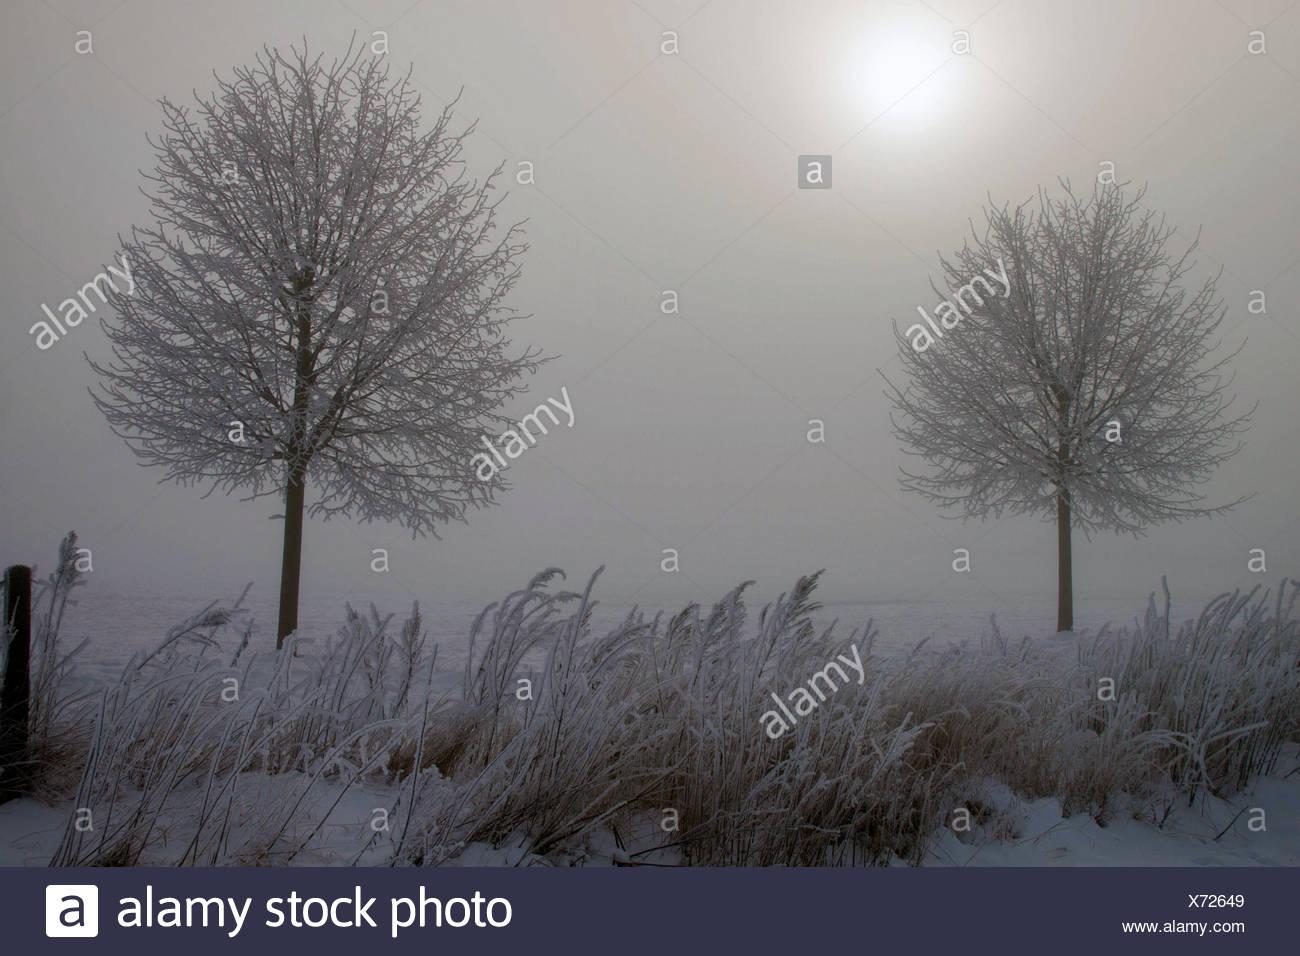 winter scenery with mist in the morning, Germany, Mecklenburg-Western Pomerania, Biestow, Rostock Stock Photo